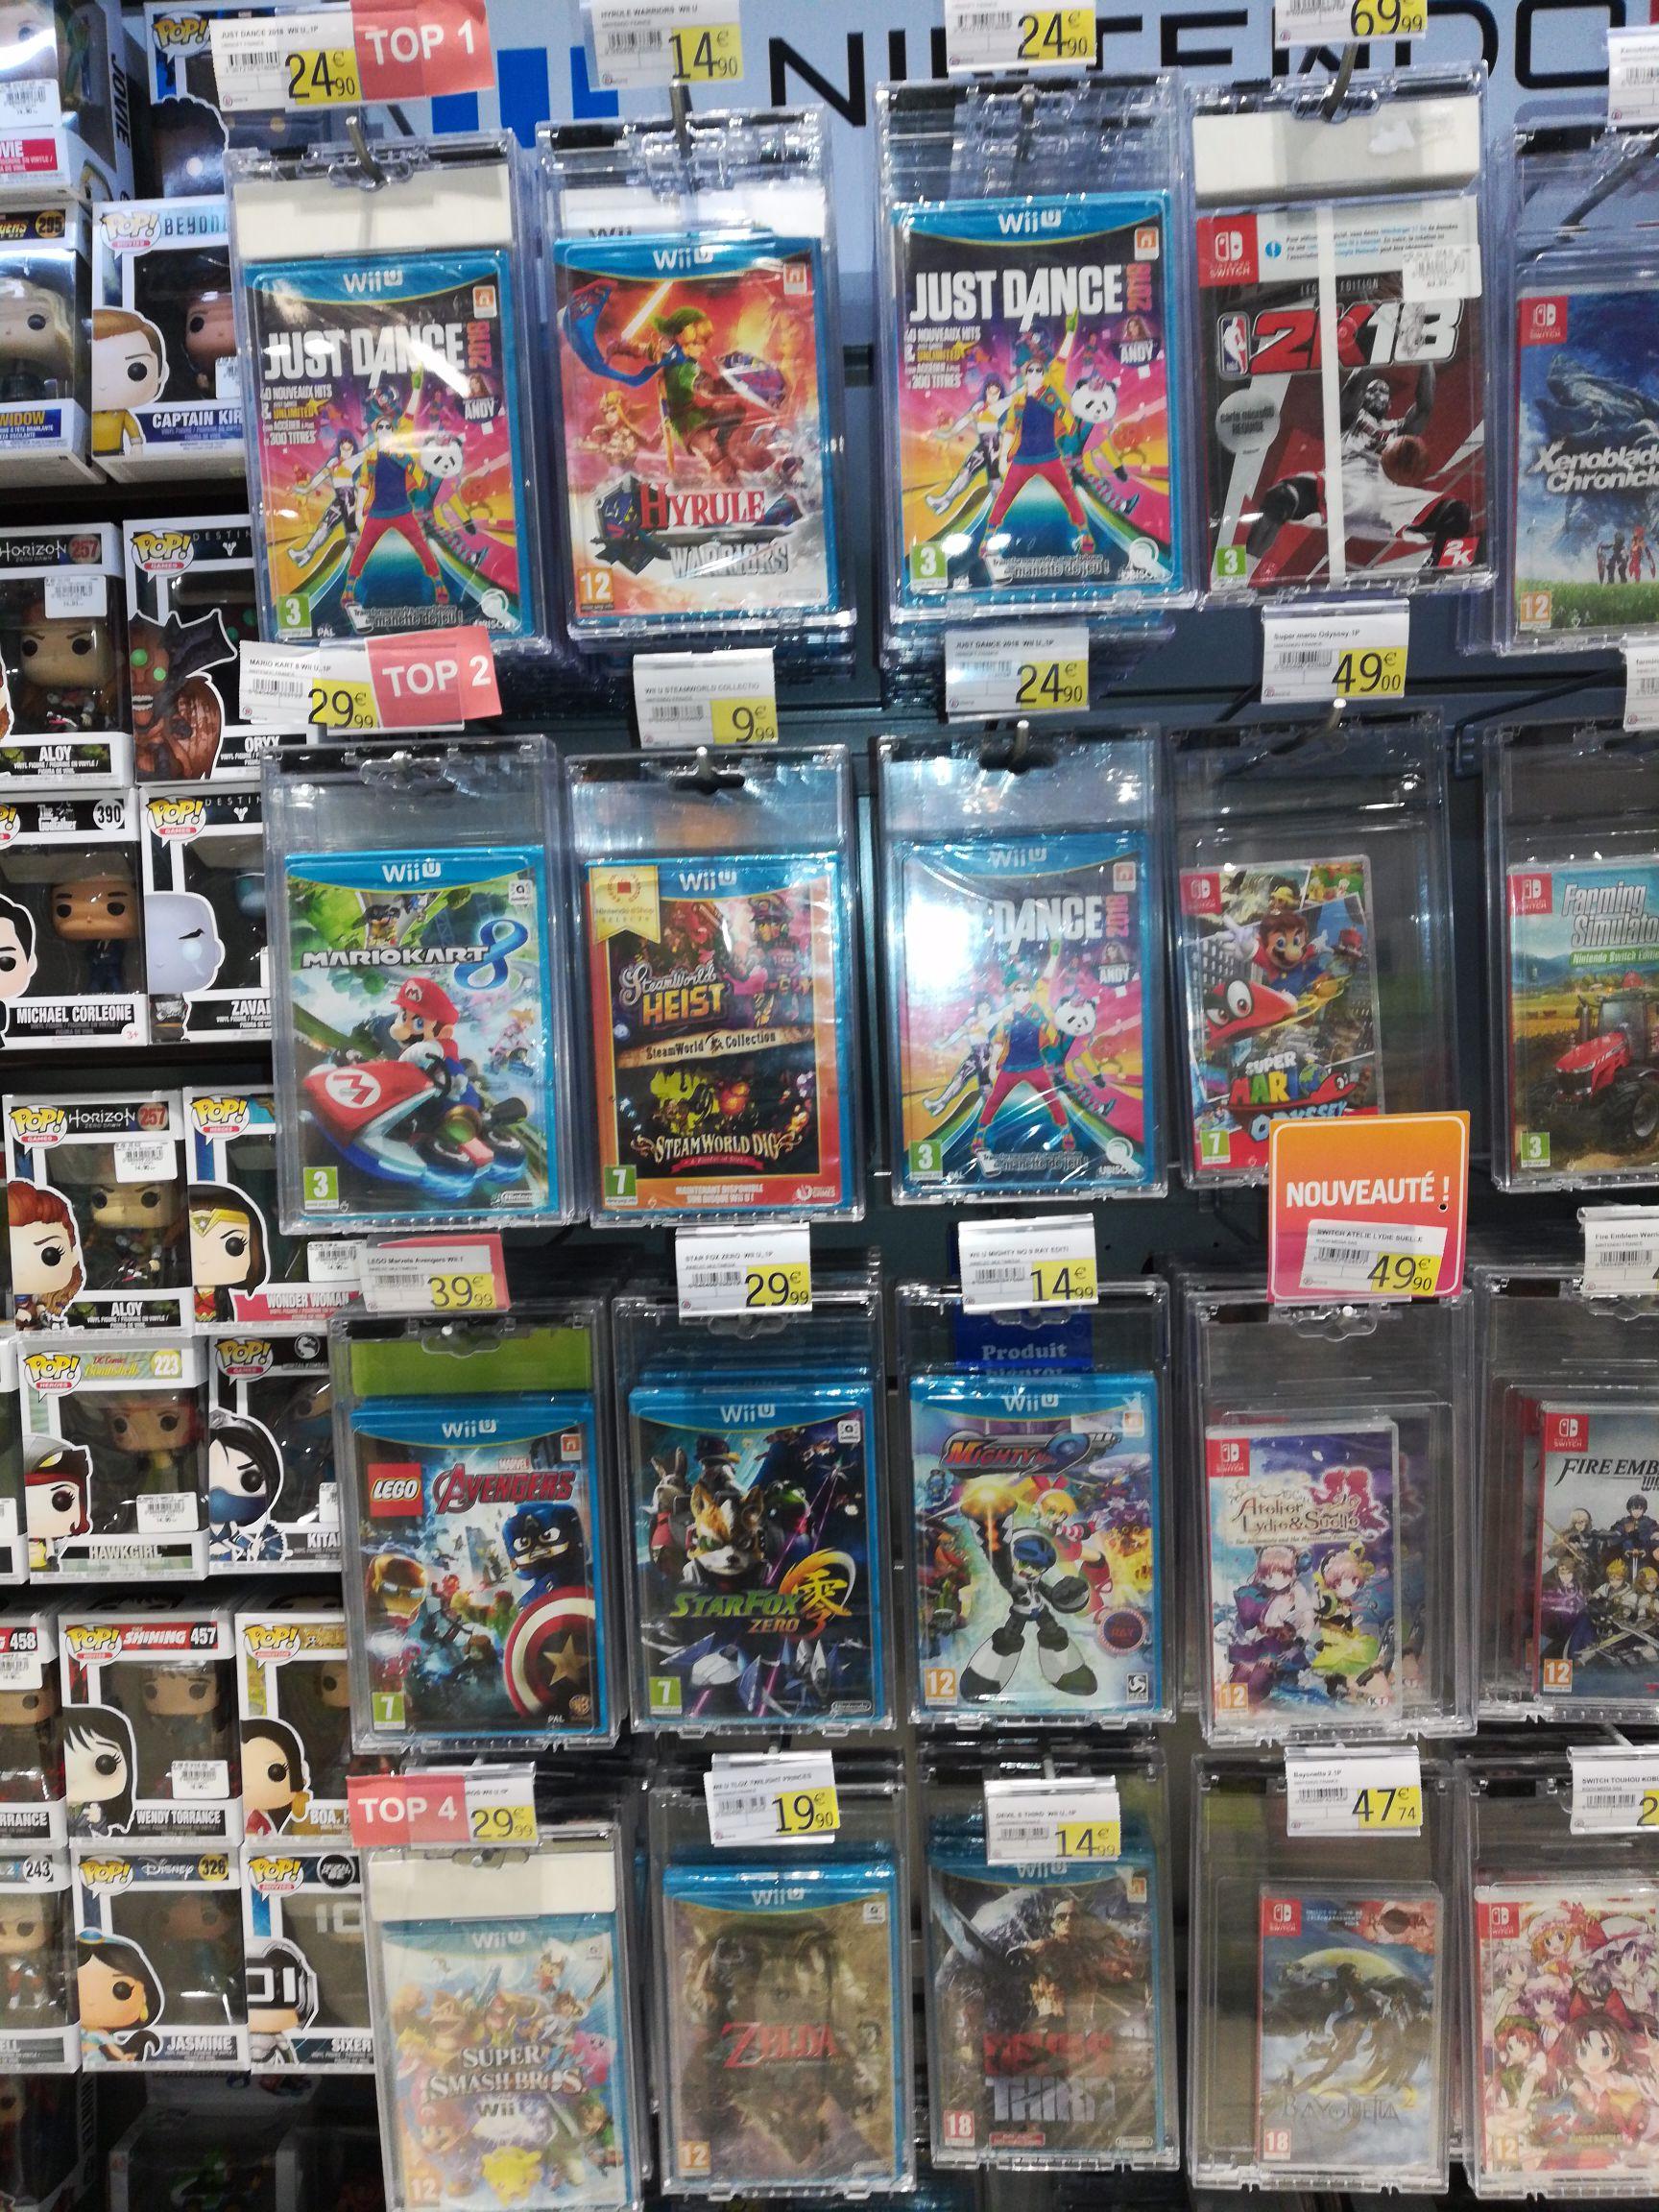 Sélection de jeux Wii U en promotion - Ex: Zelda Hyrule Warriors à 14.90€, The Legend of Zelda: Twilight Princess à 19.90€ - Osny (95)